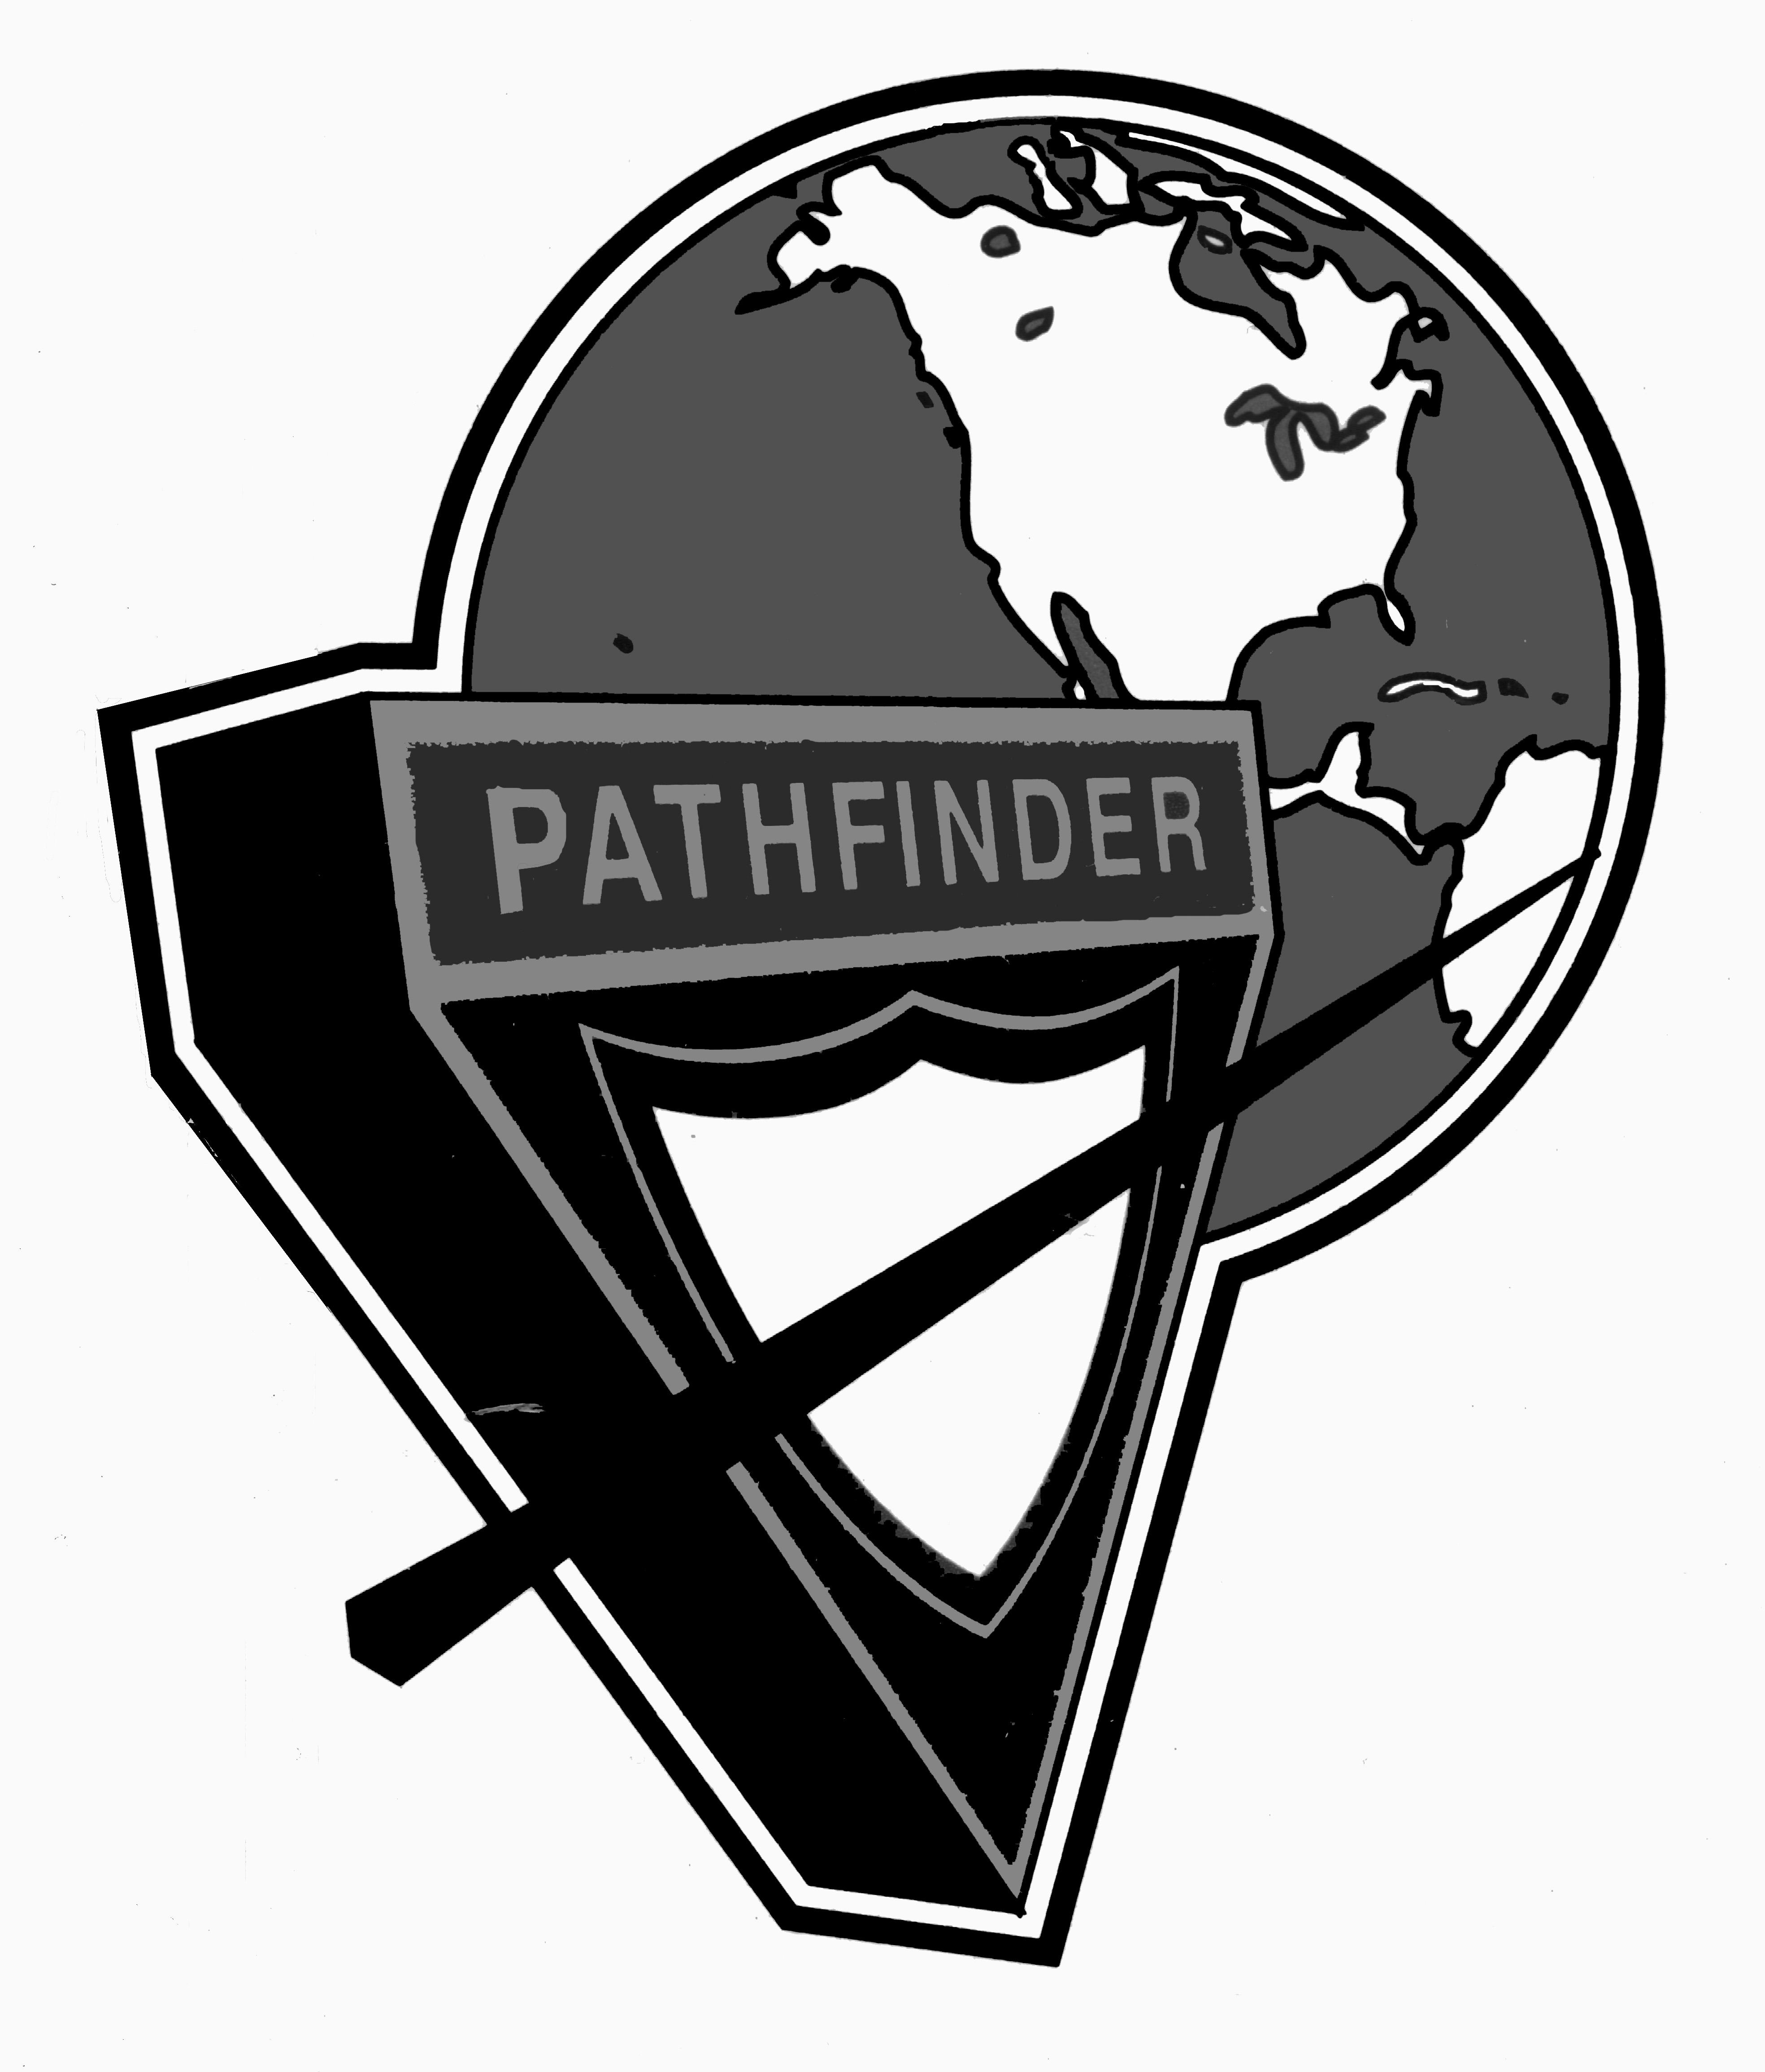 Pathfinder Logos - PathfindersOnline org